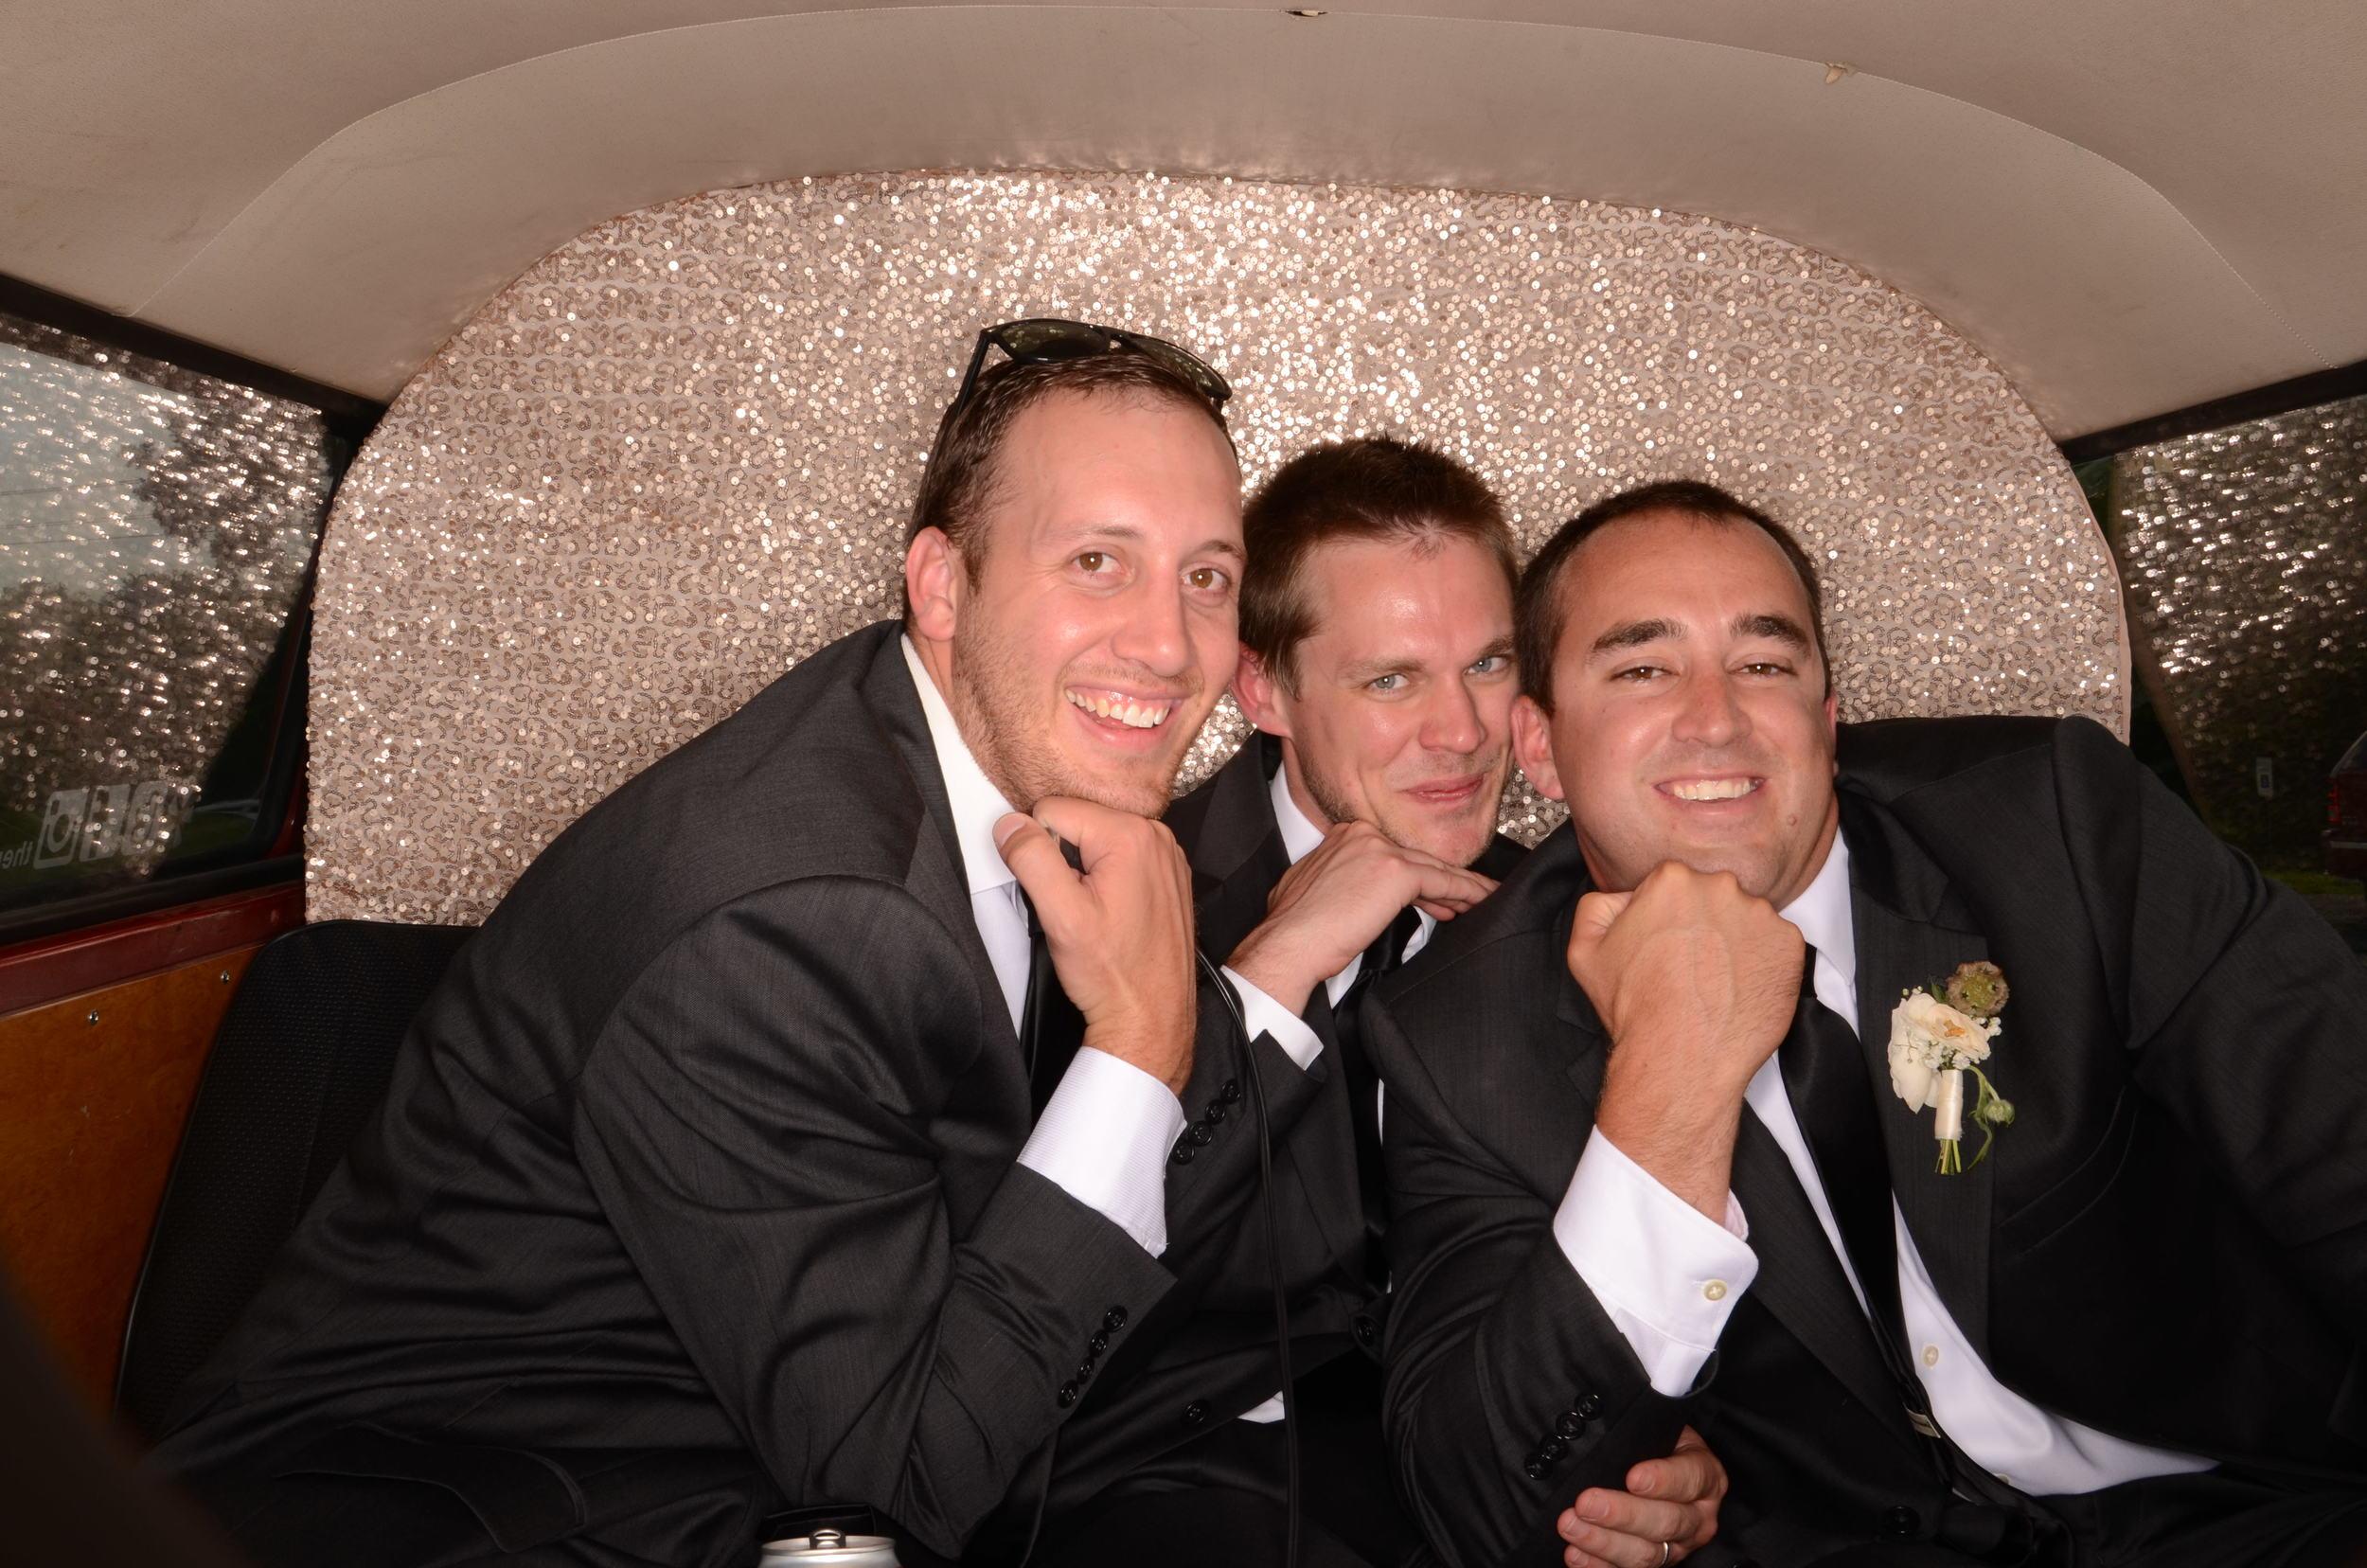 fun-wedding-photobooth-the-photo-bus